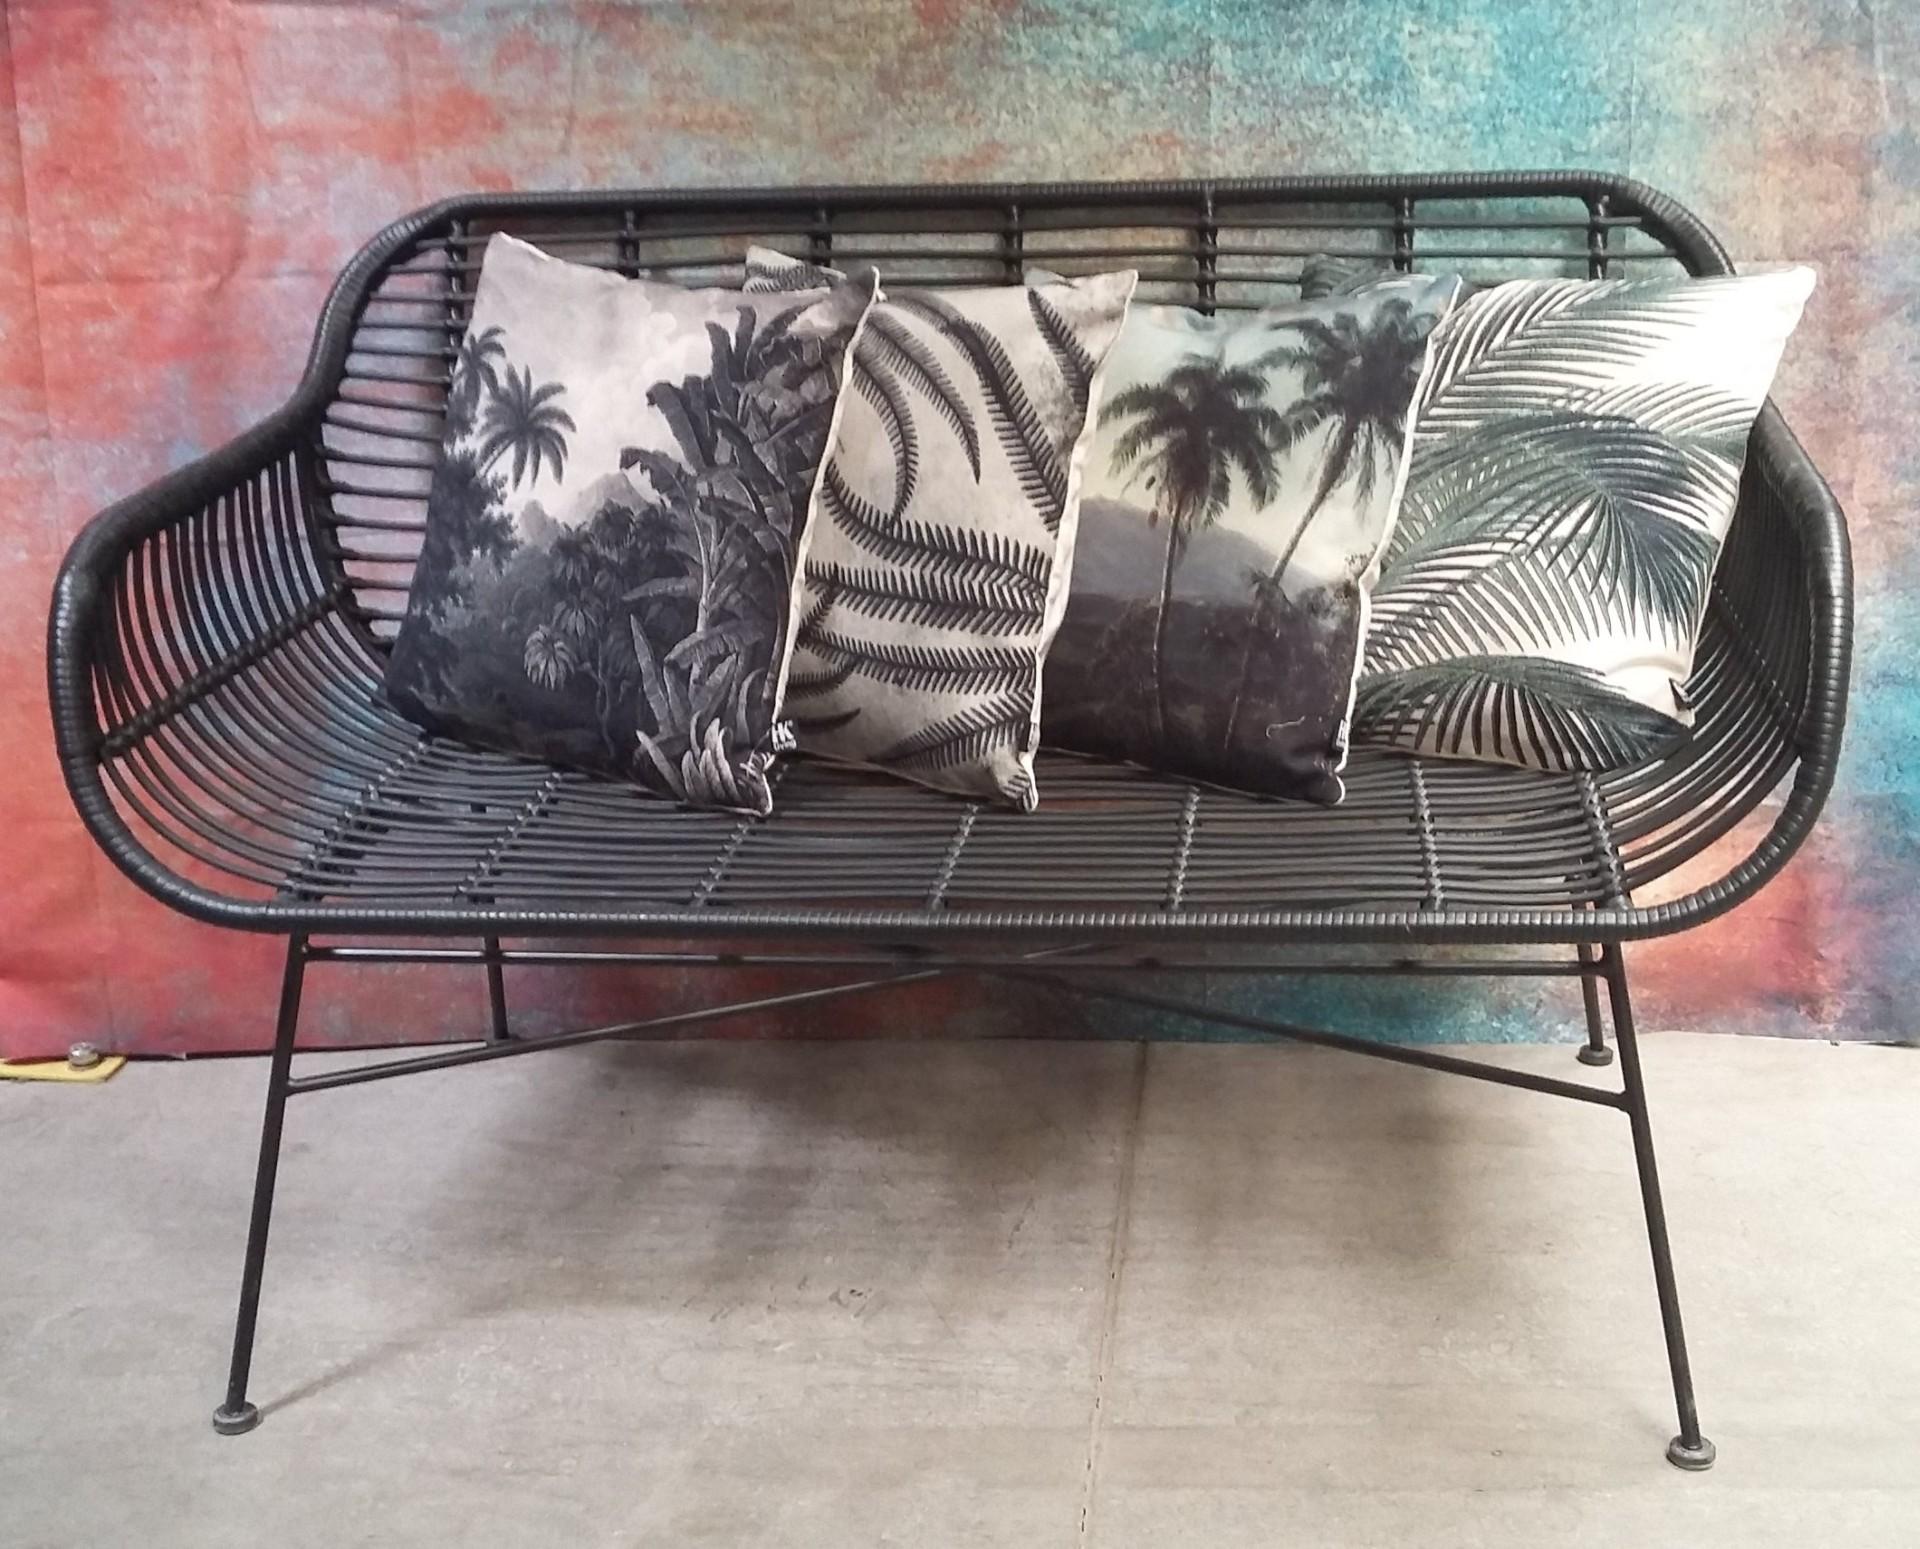 retro sofa acapulco chair rattan outdoor rund schwarz m bel sessel sofas vintagehaus. Black Bedroom Furniture Sets. Home Design Ideas